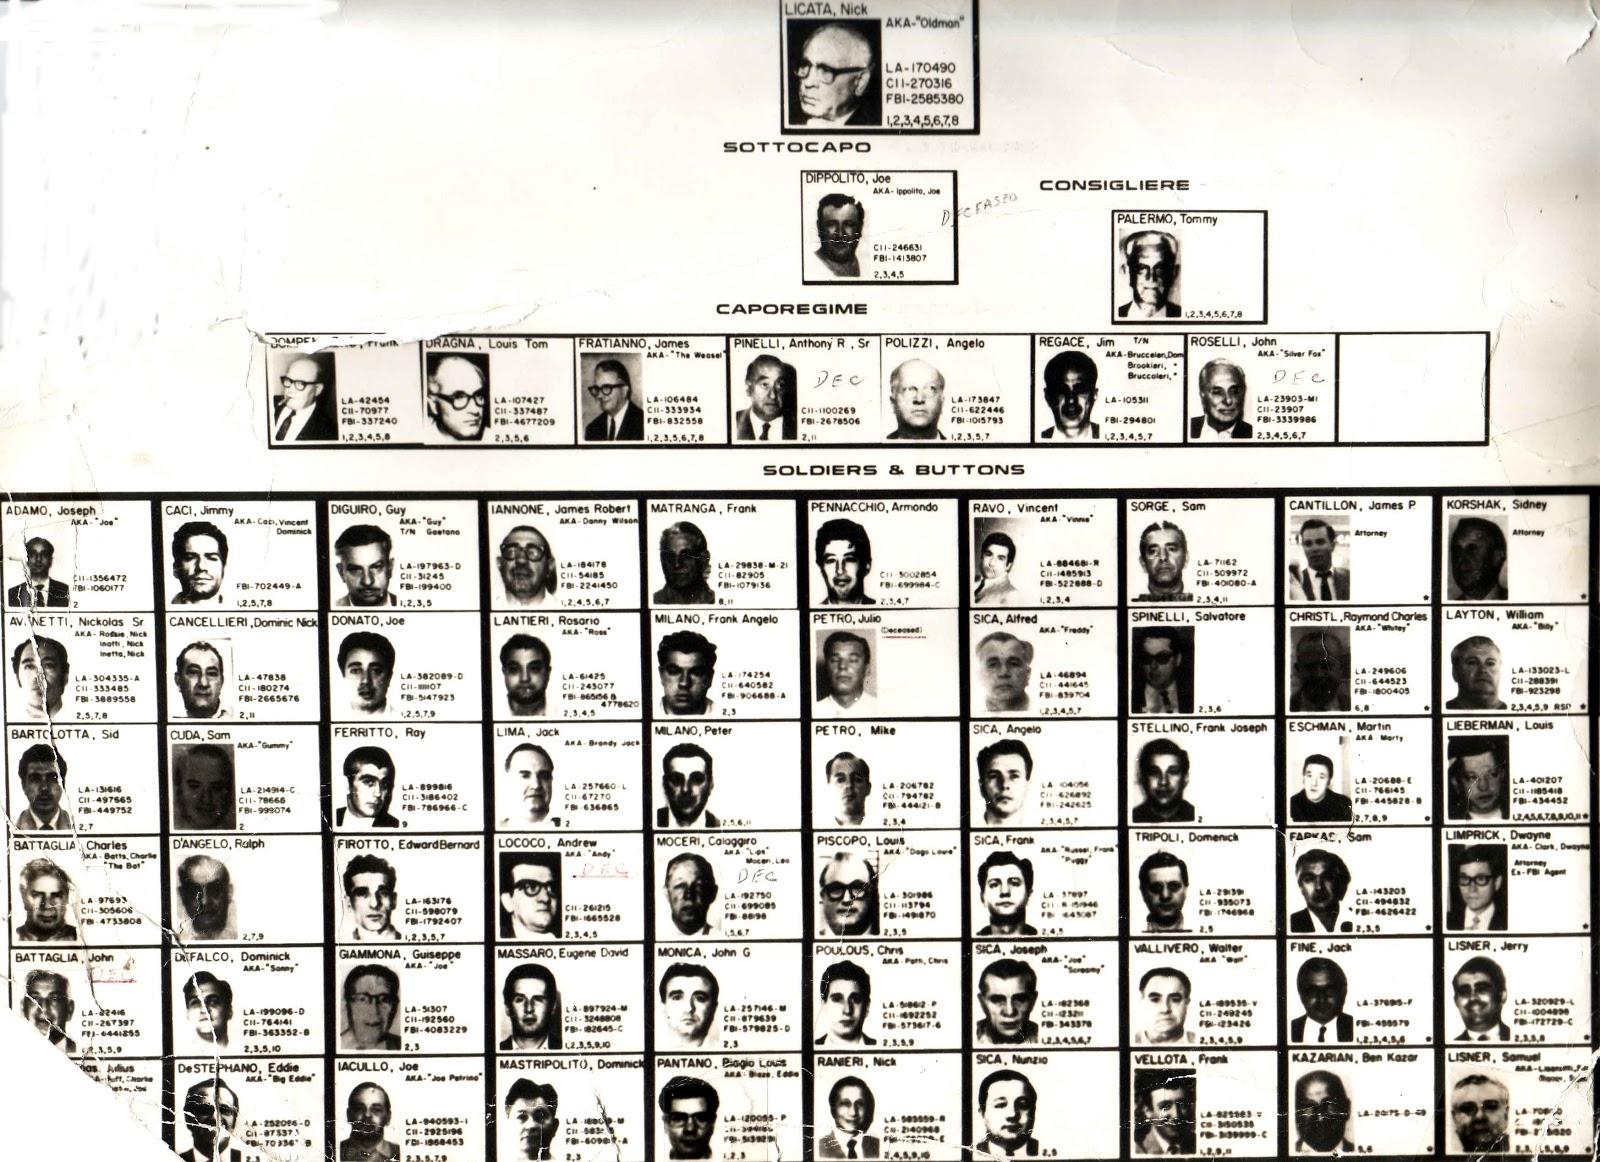 Los Angeles crime family | Mafia Wiki | FANDOM powered by Wikia